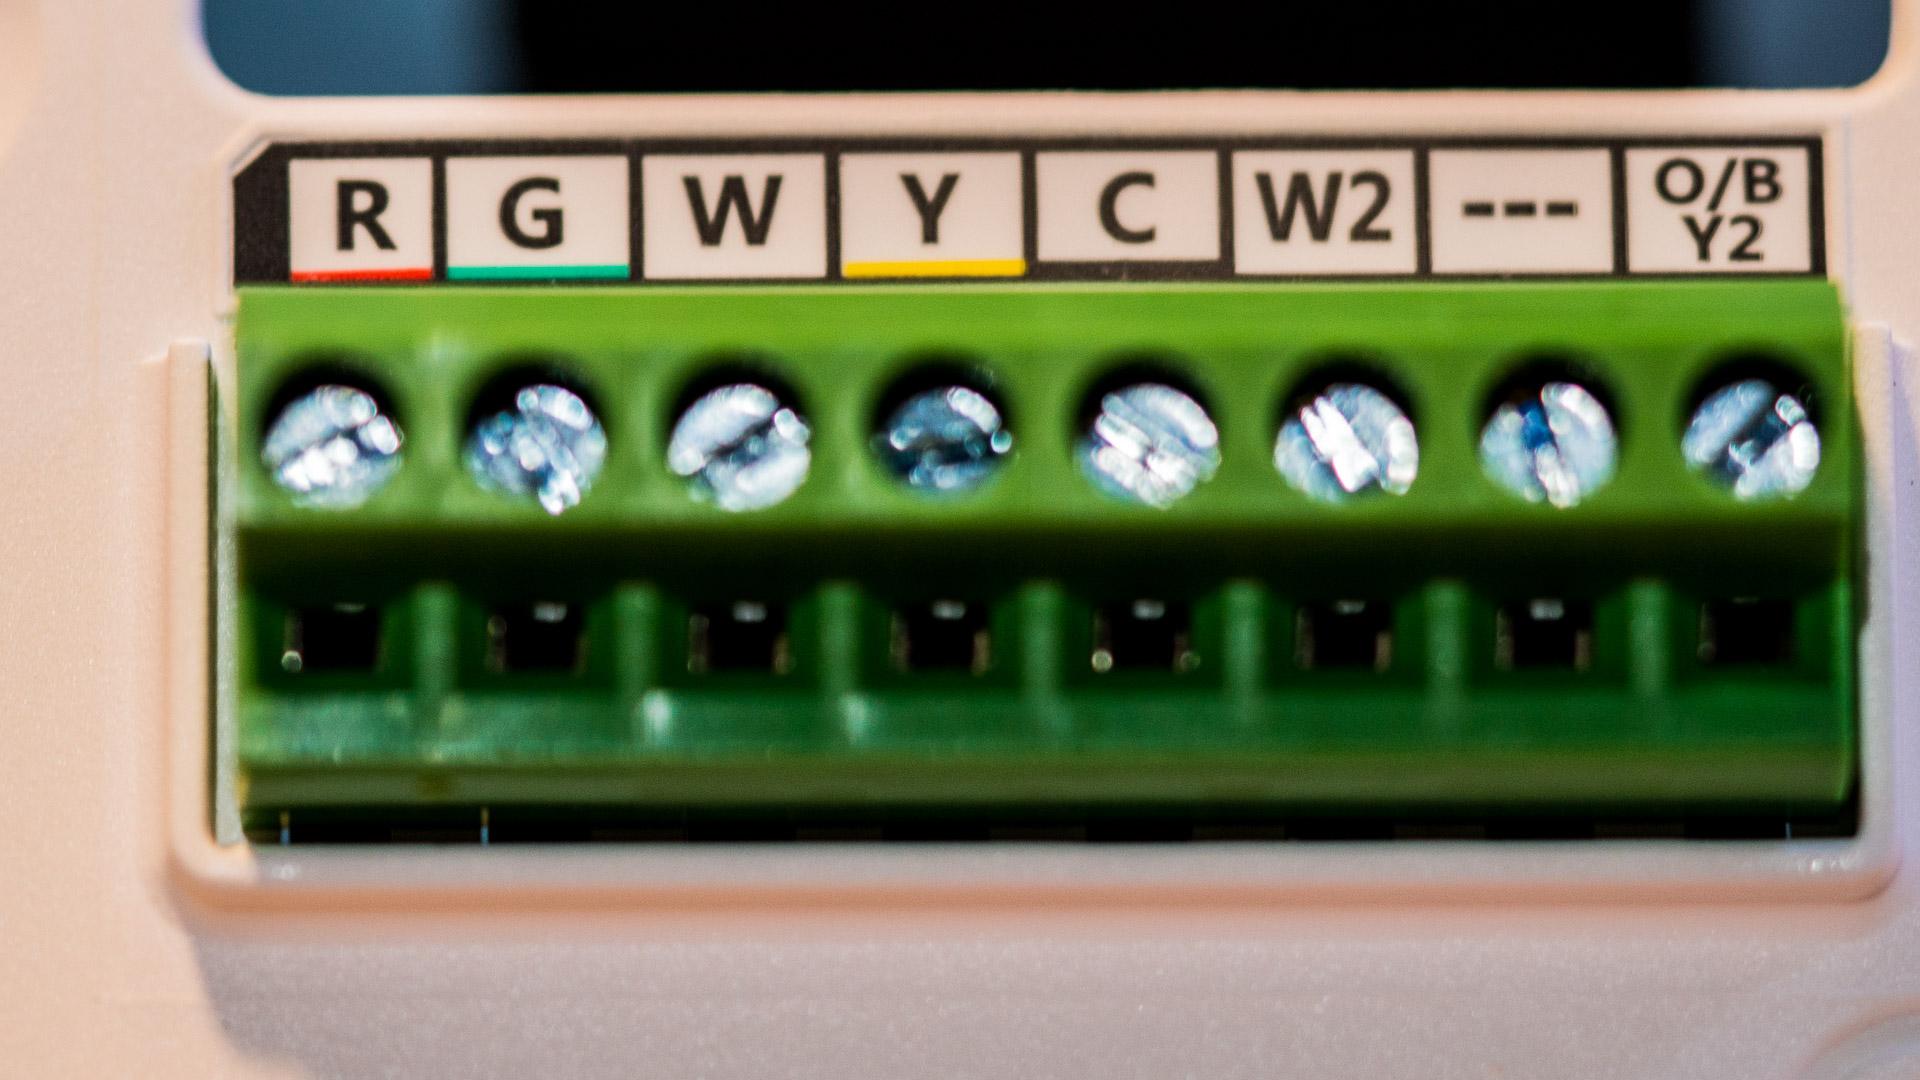 vine, TJ-610, Thermostat, C-wire